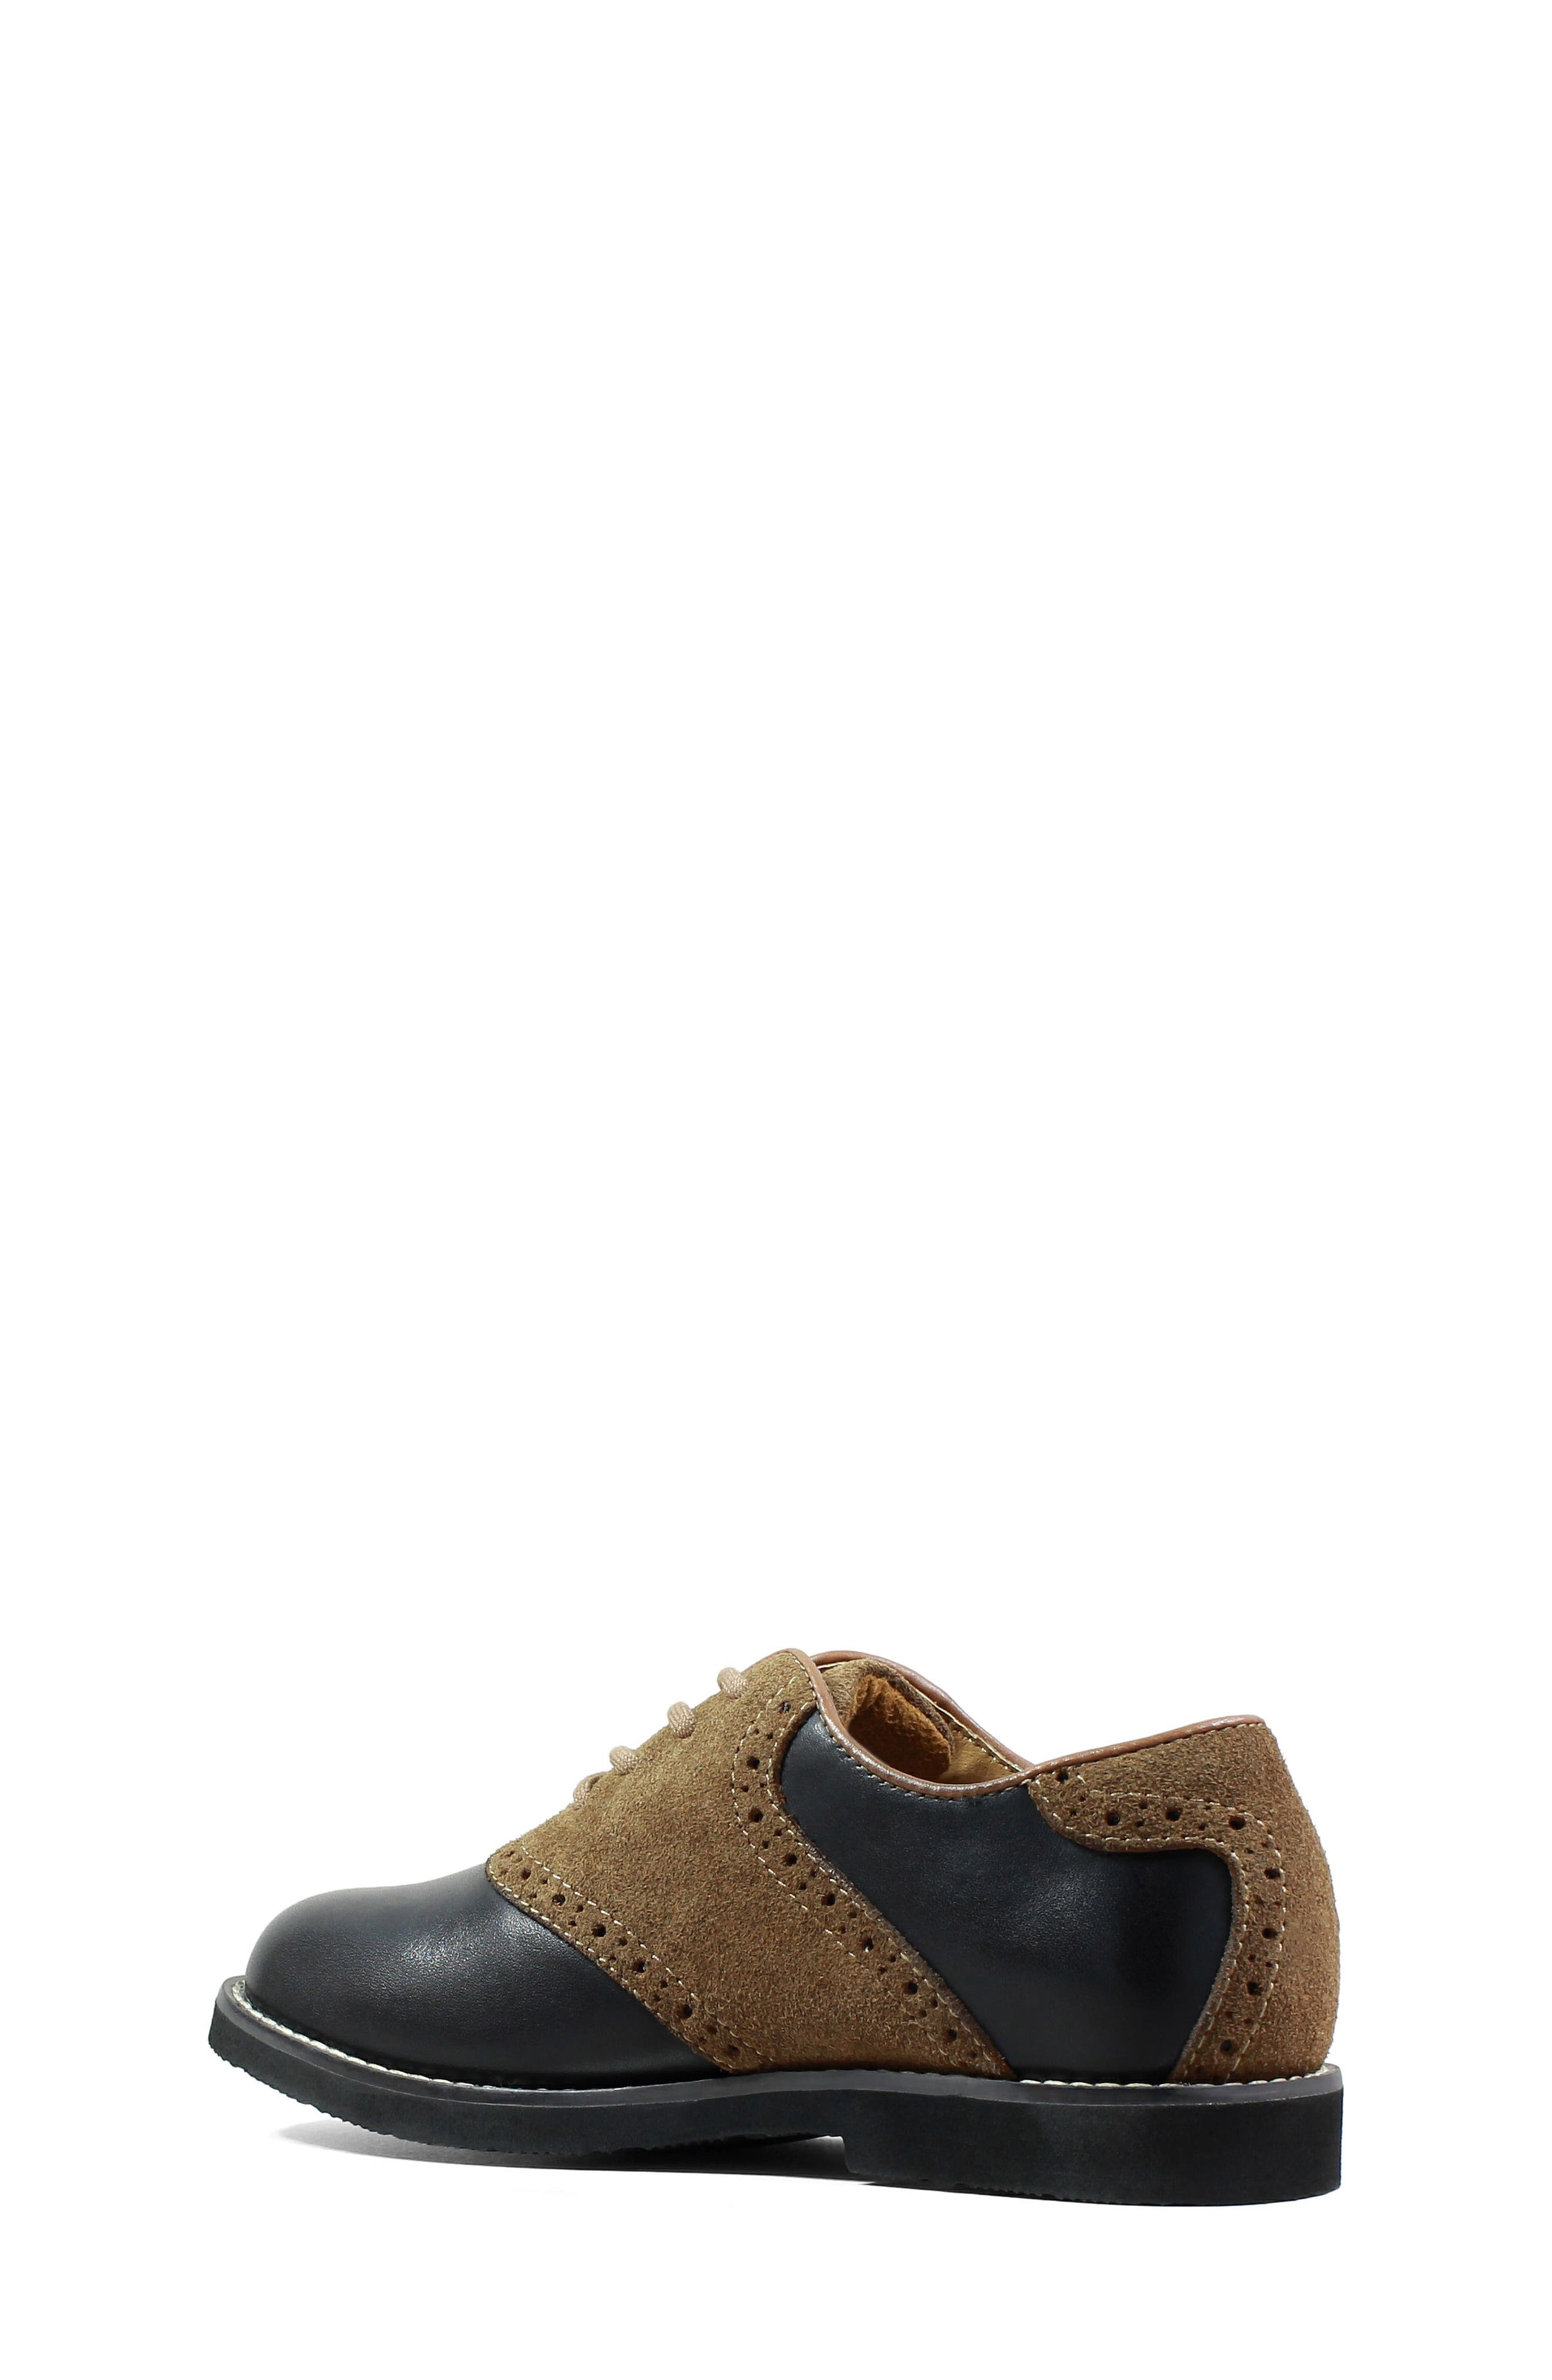 FLORSHEIM, 'Kennett Jr. II' Saddle Shoe, Main thumbnail 1, color, SMOOTH BLACK W/ MOCHA SUEDE